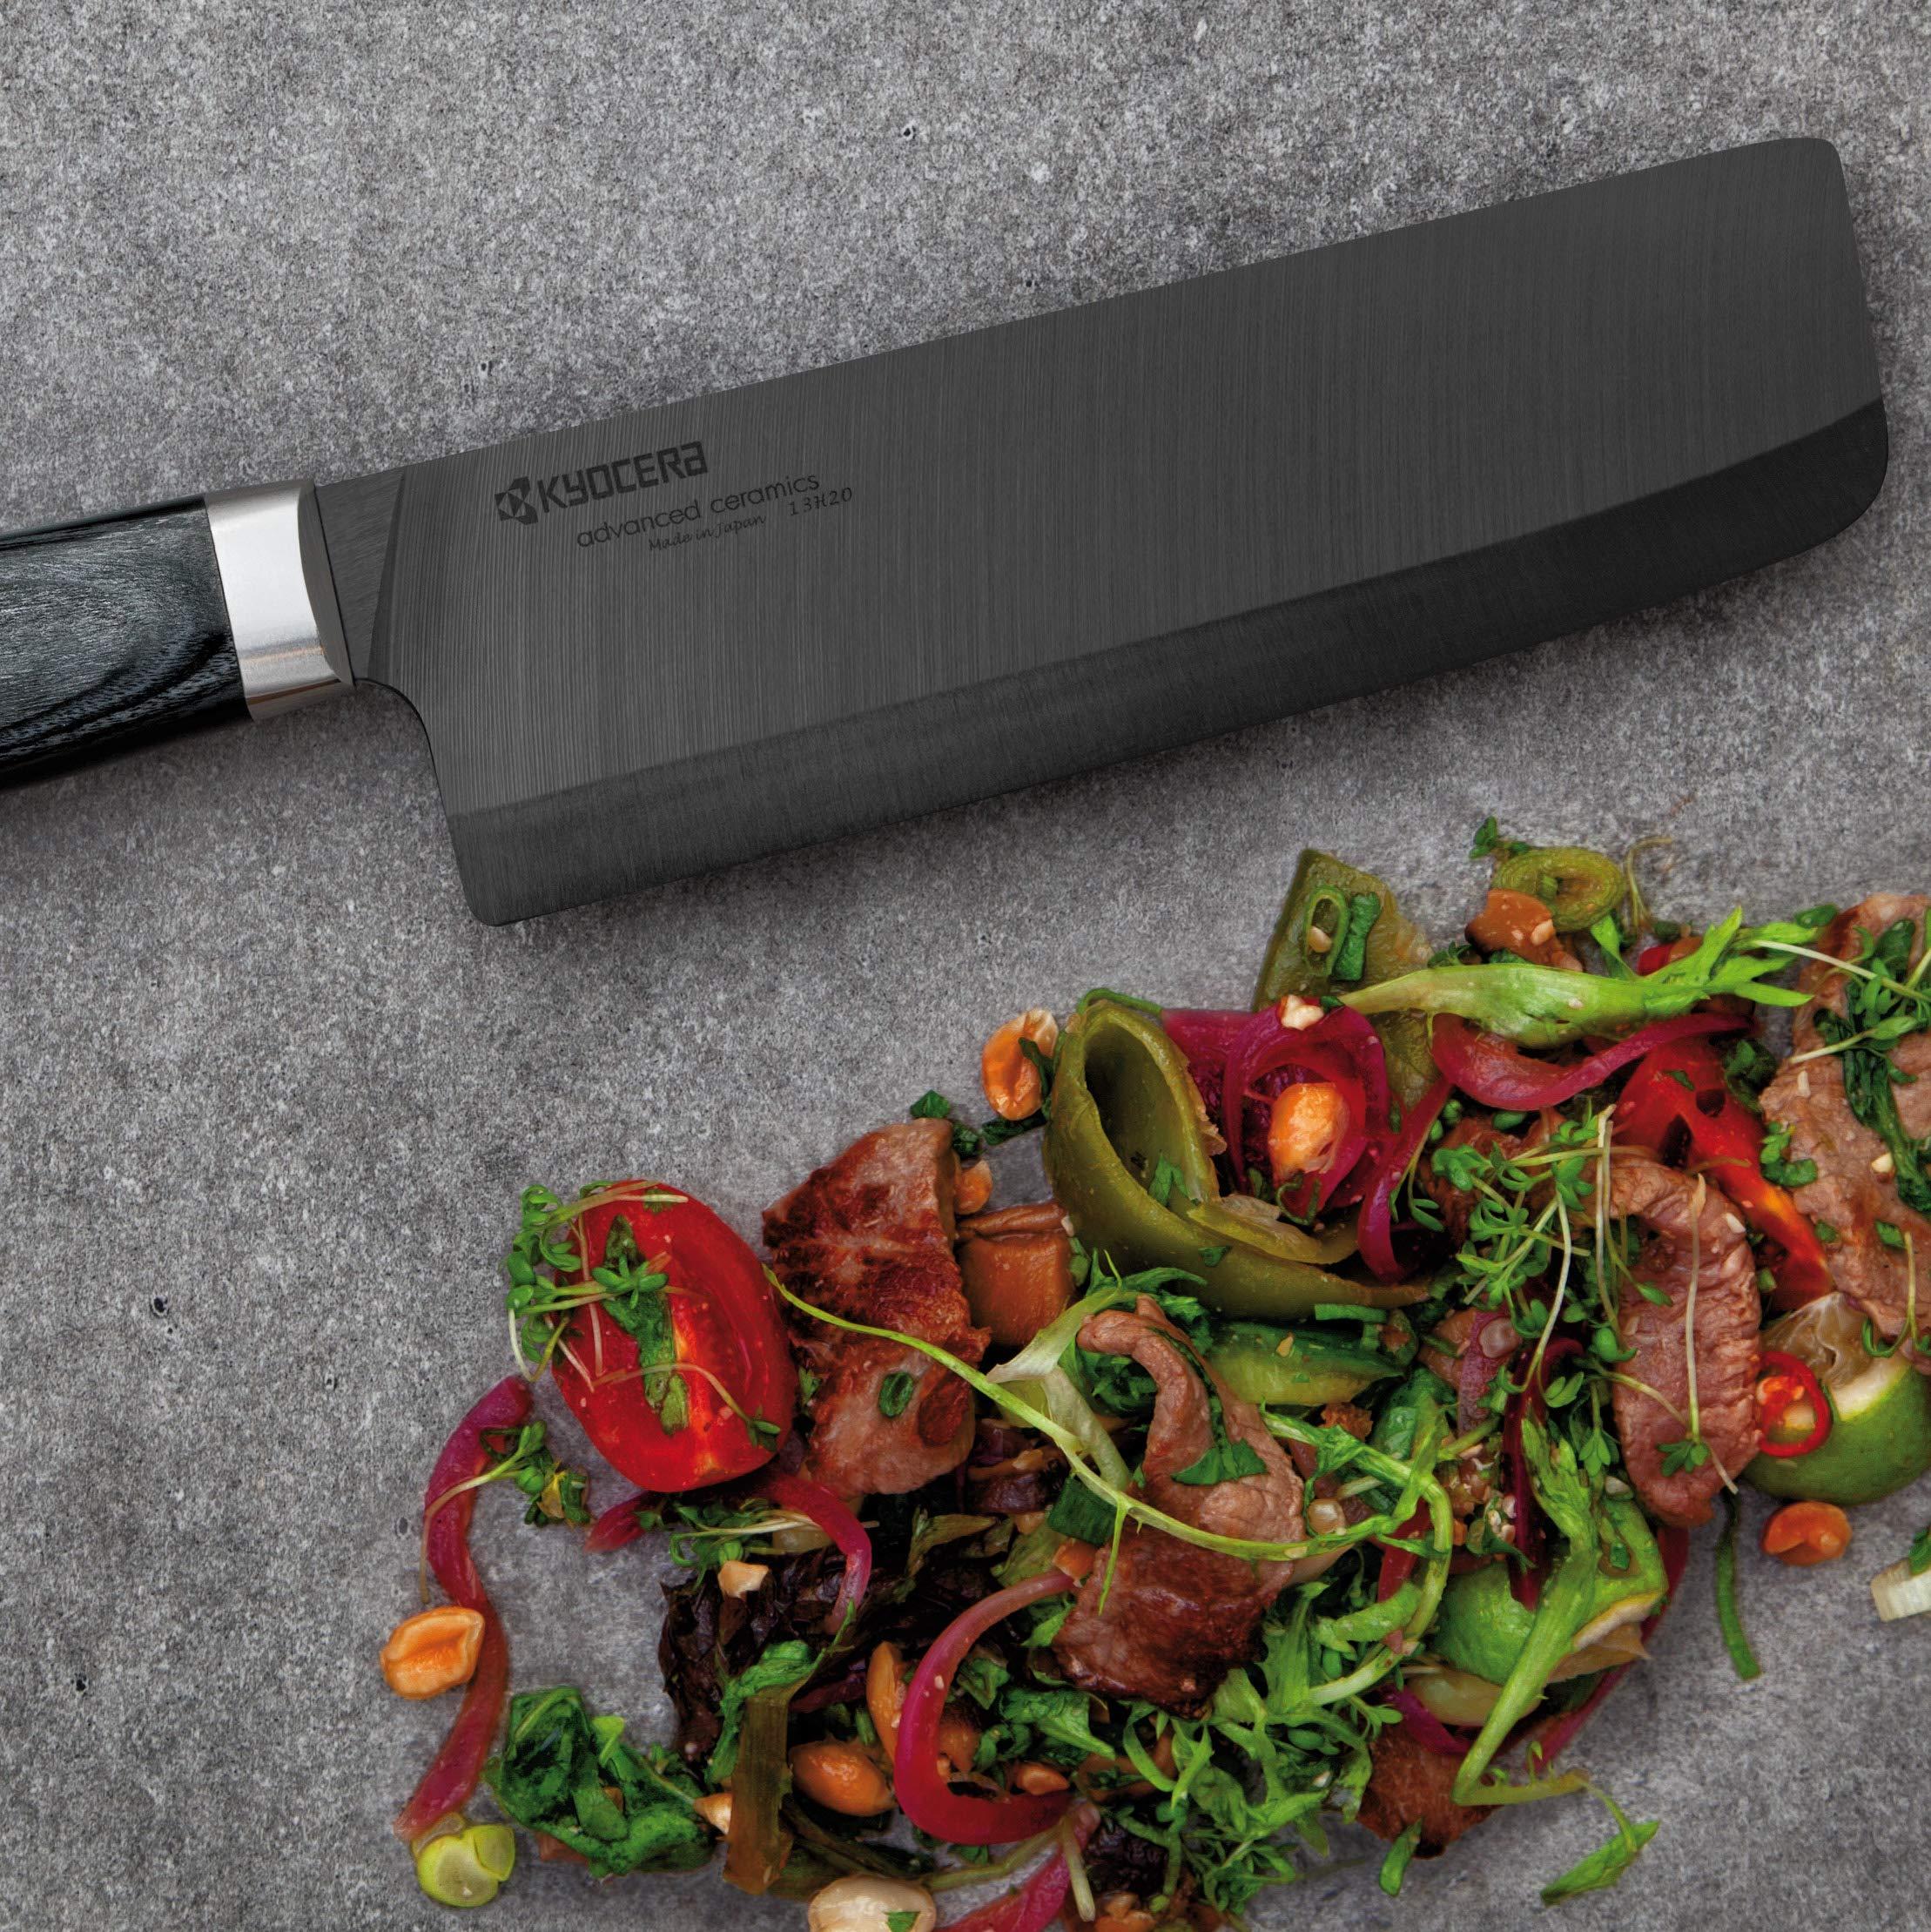 Kyocera Advanced Ceramic LTD Series Nakiri Knife with Handcrafted Pakka Wood Handle, 6-Inch, Black Blade by Kyocera (Image #4)